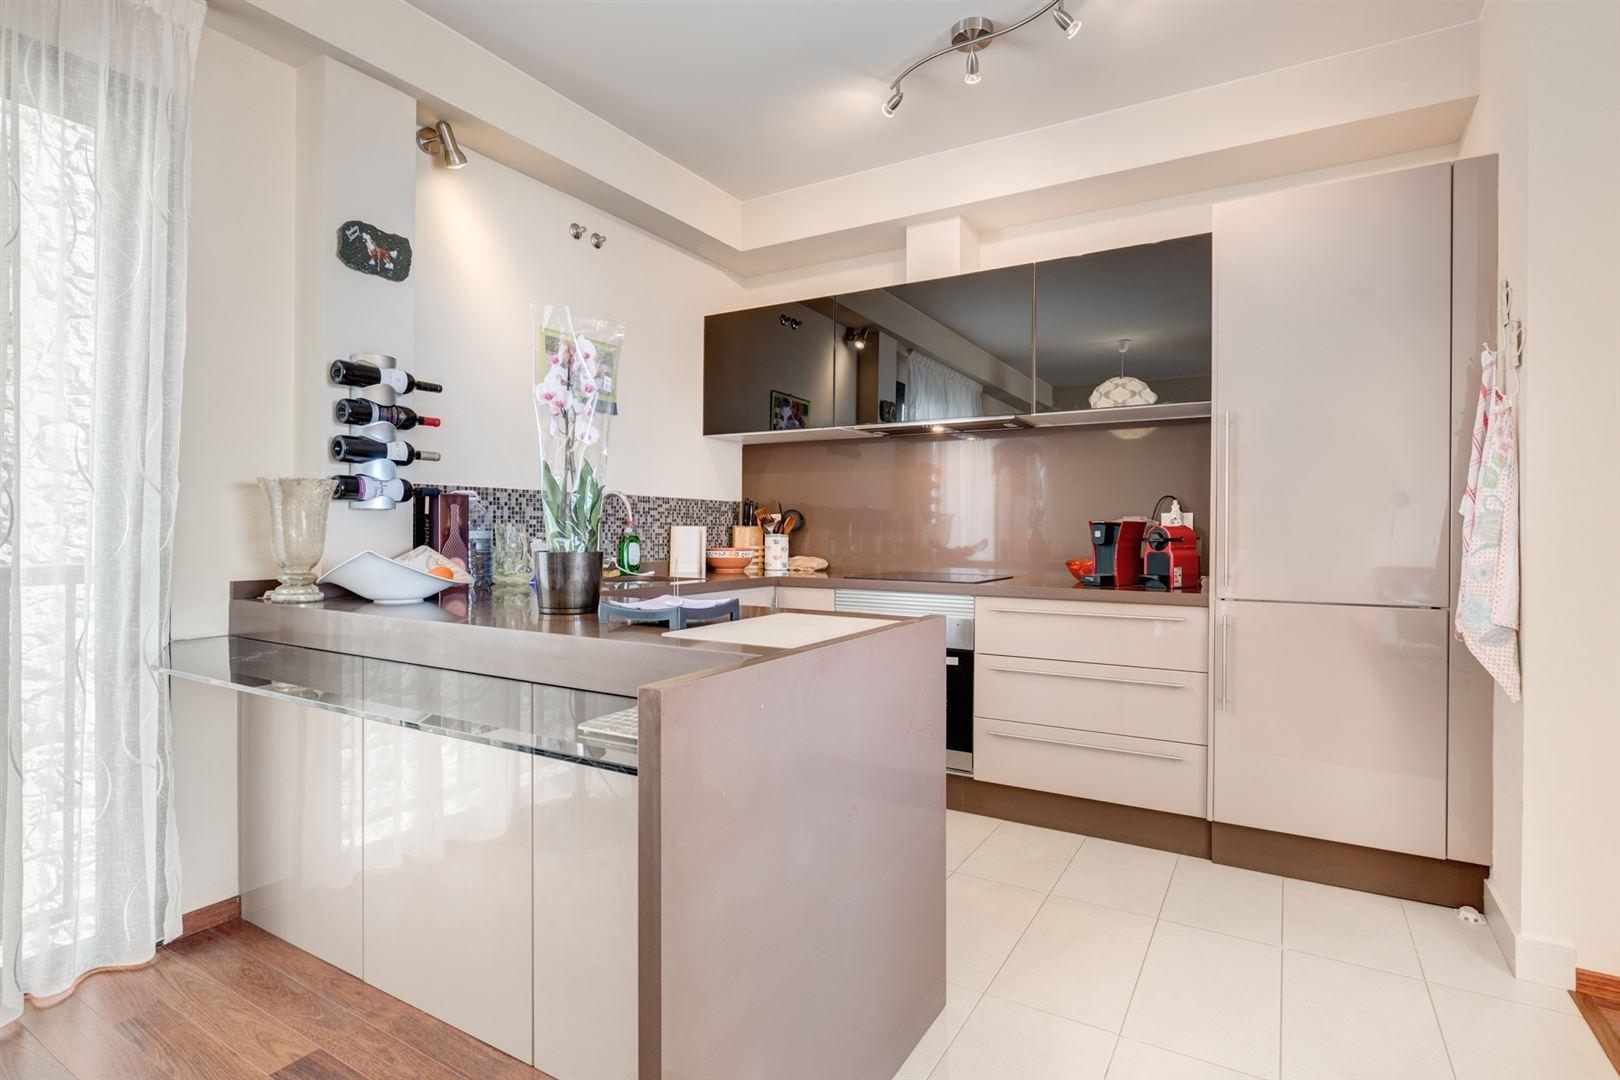 Foto 7 : Appartement te  TENERIFE (Spanje) - Prijs € 645.000